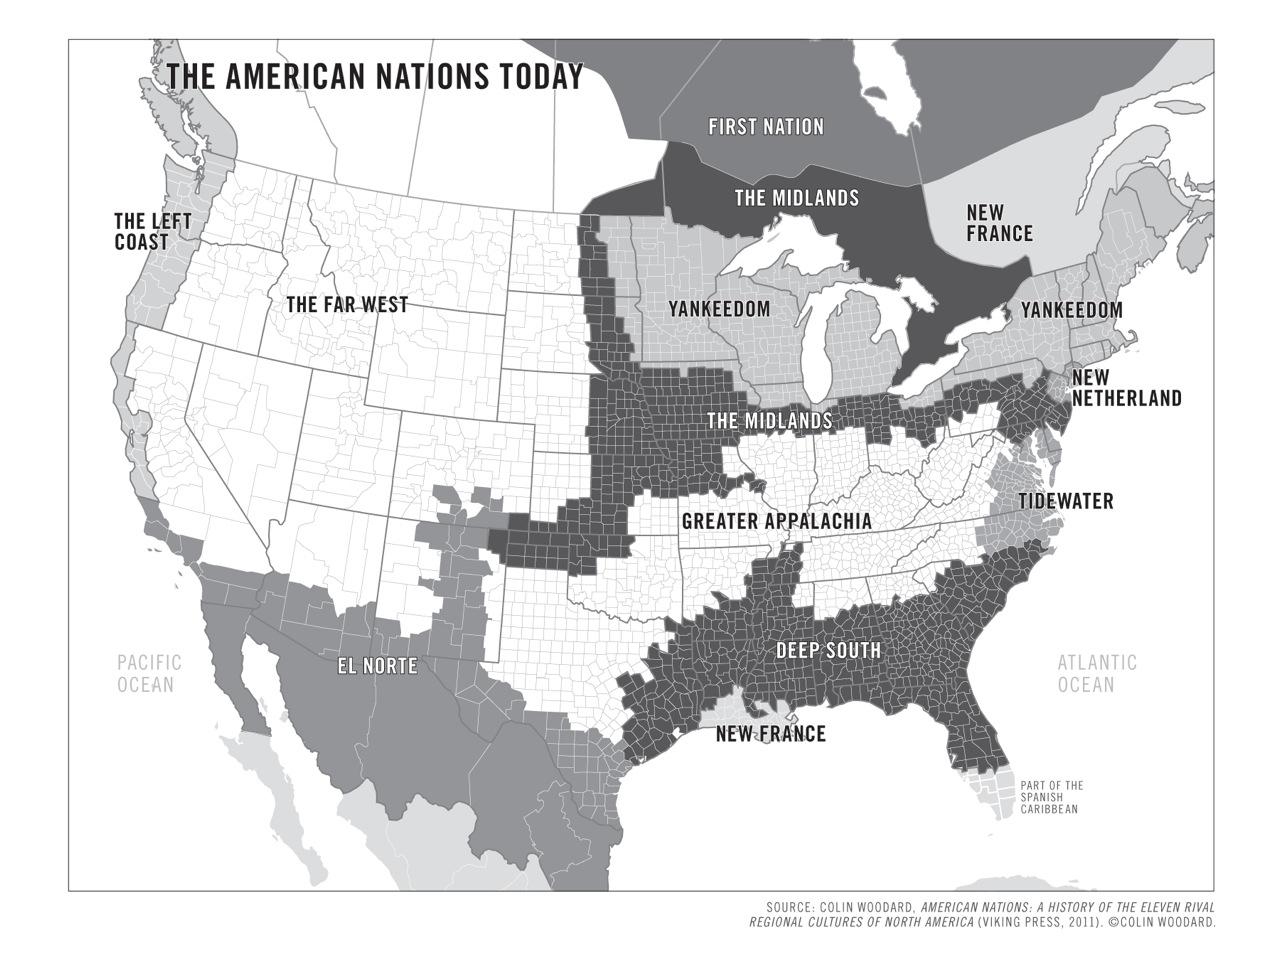 ColinWoodard_AmericanNations_map